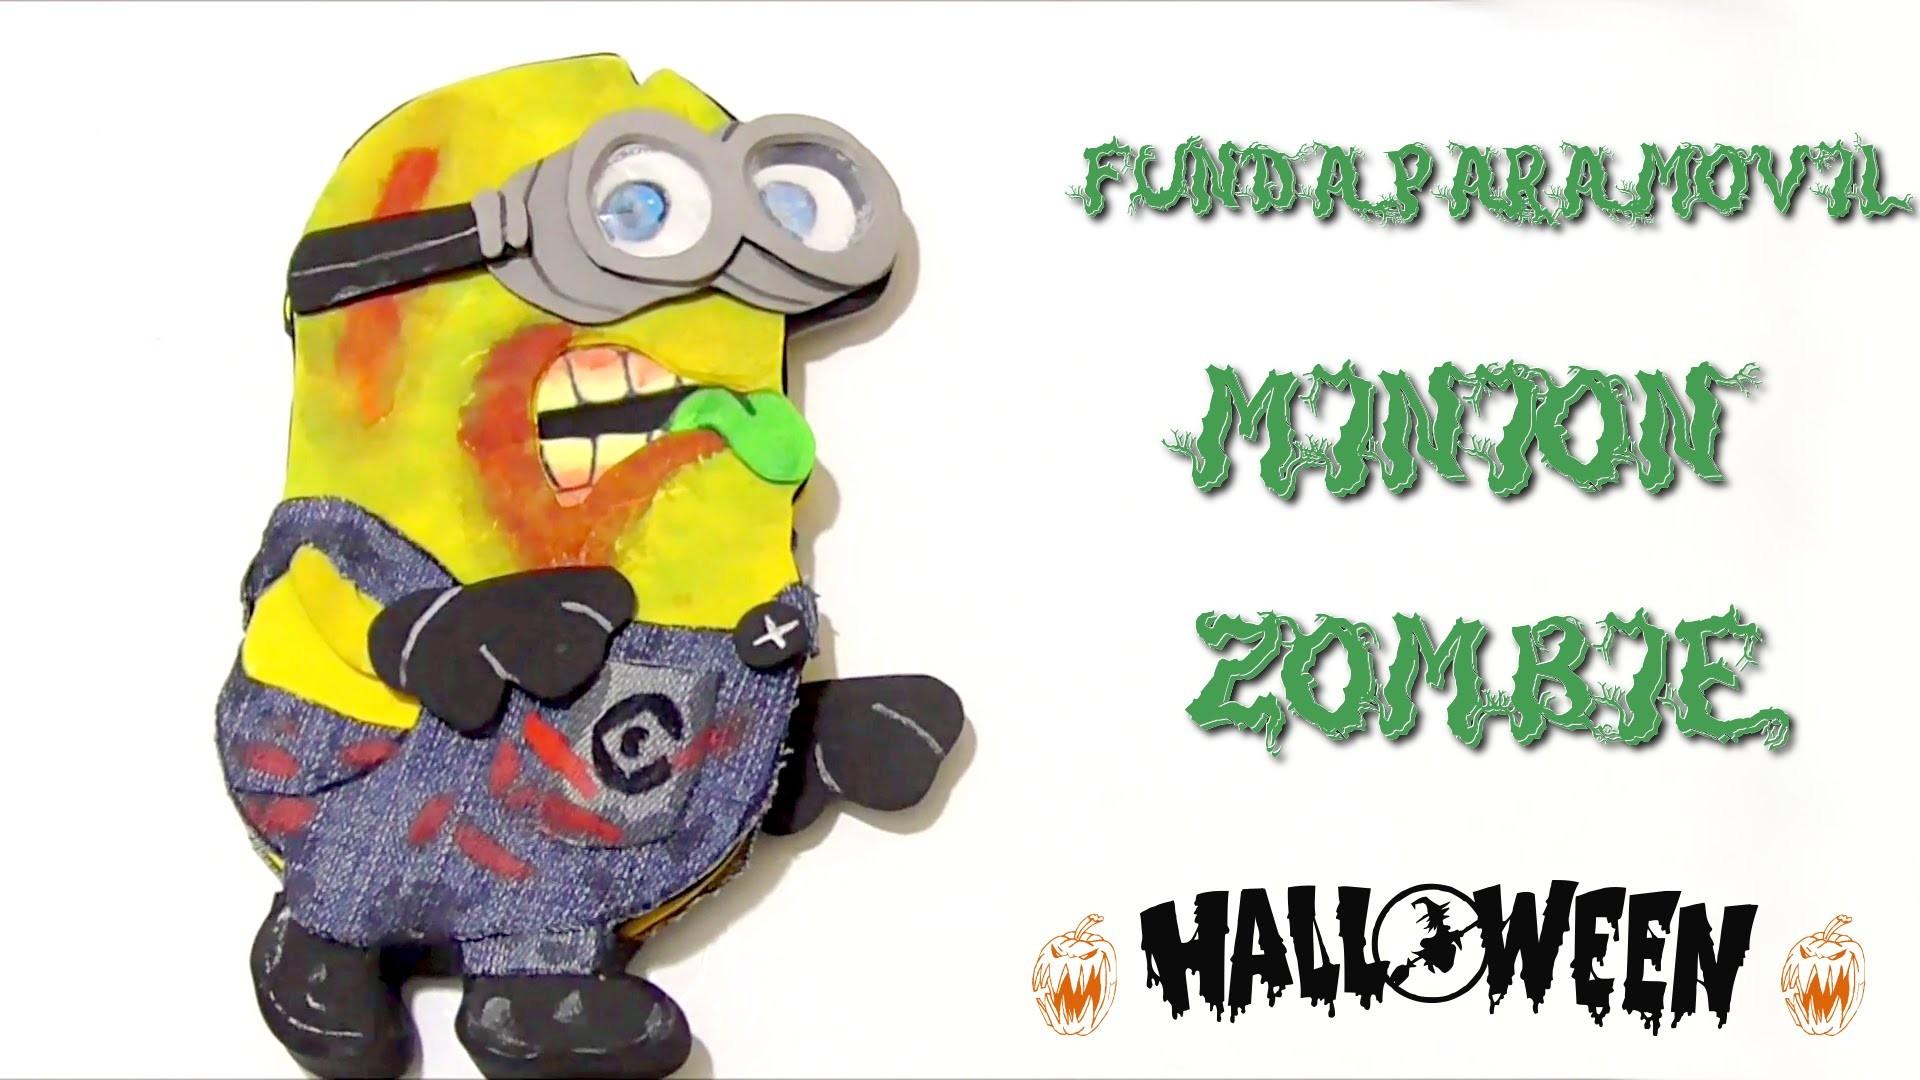 Cómo hacer fundas para celulares - Funda Minion Zombie #halloween2015